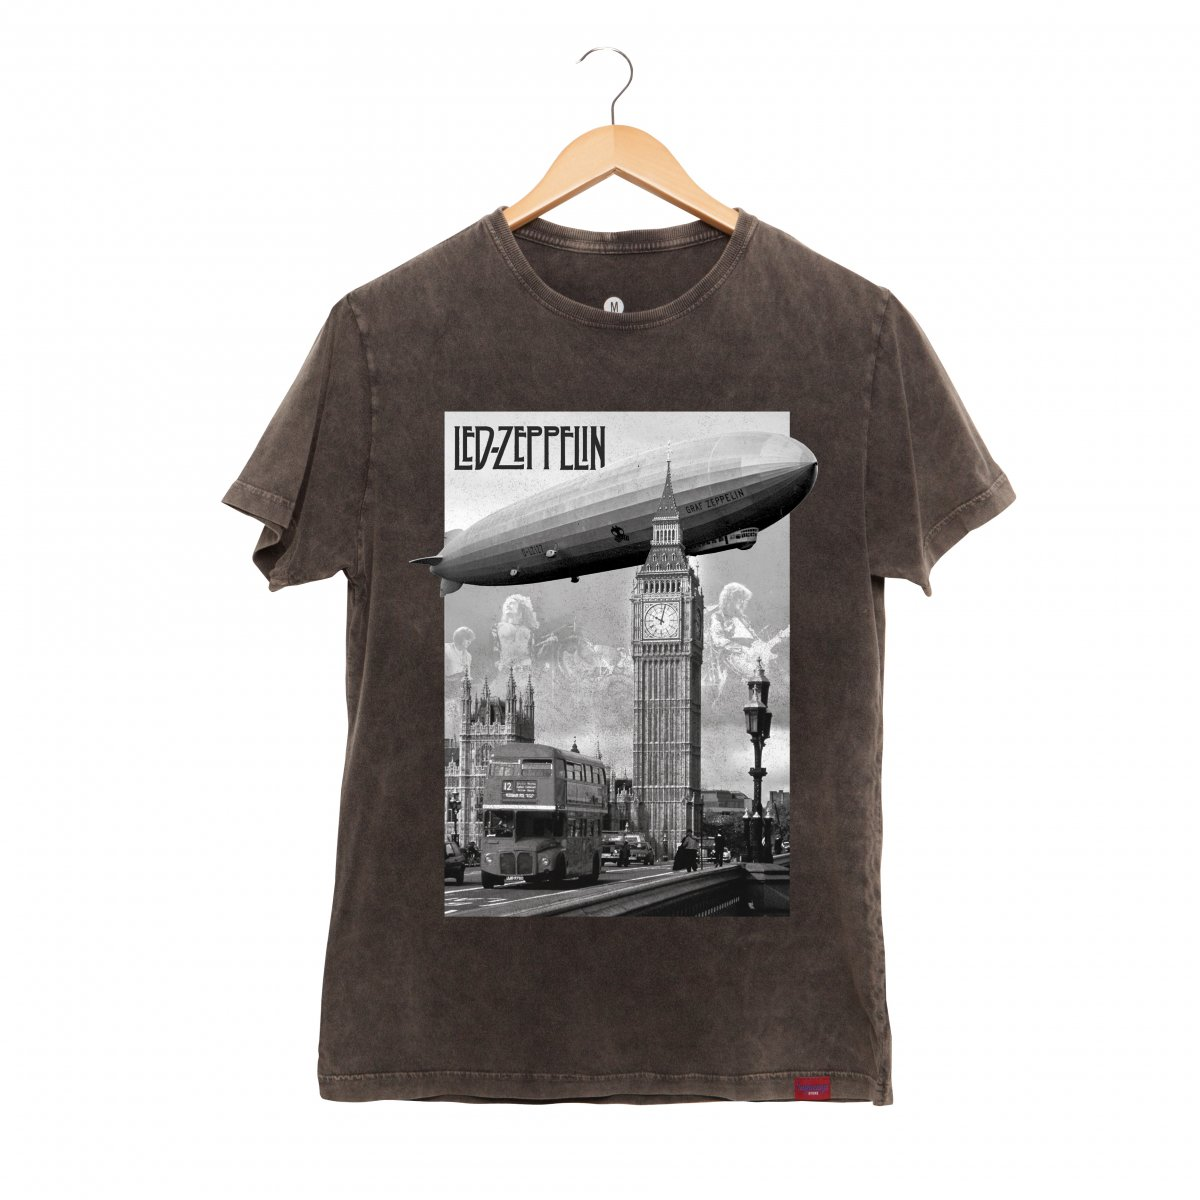 1075bbaf4f Camiseta Masculina Ano Novo Frases Camisetas